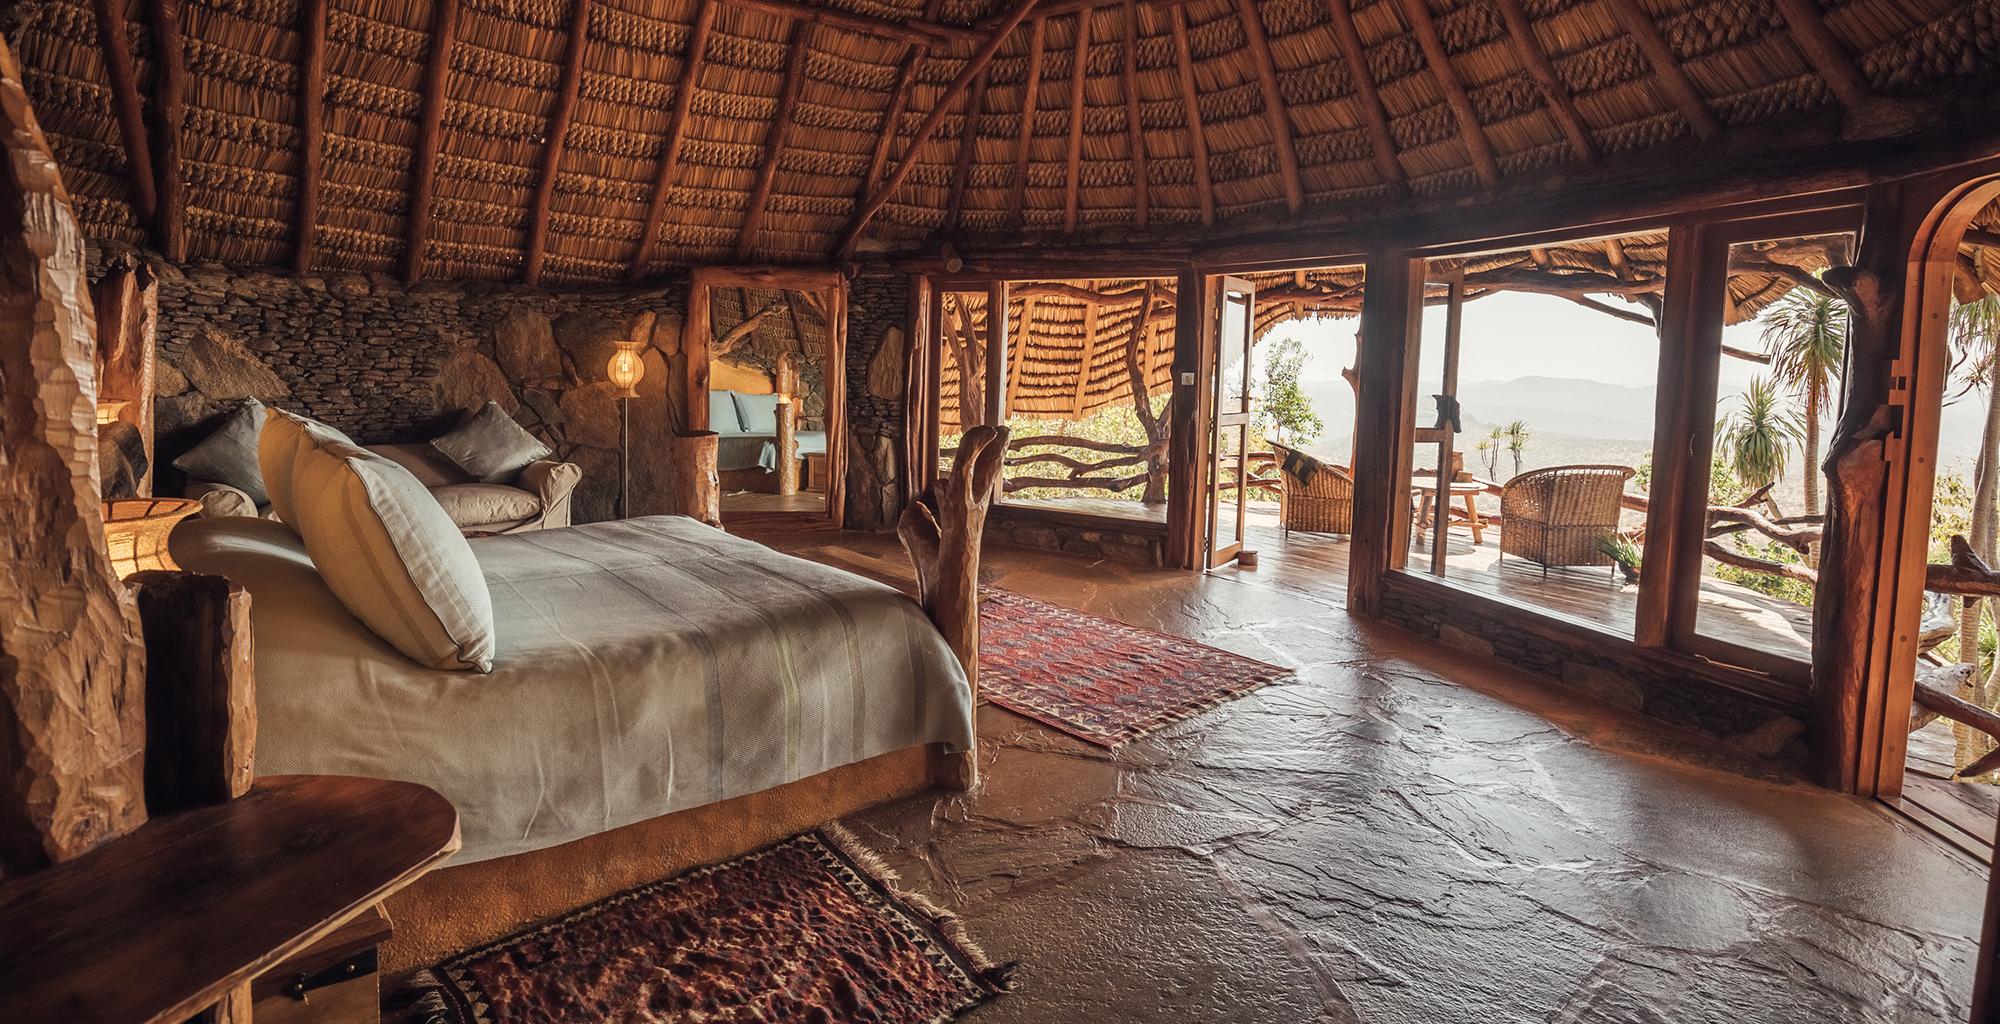 Kenya-Ol-Malo-Lodge-Bedroom